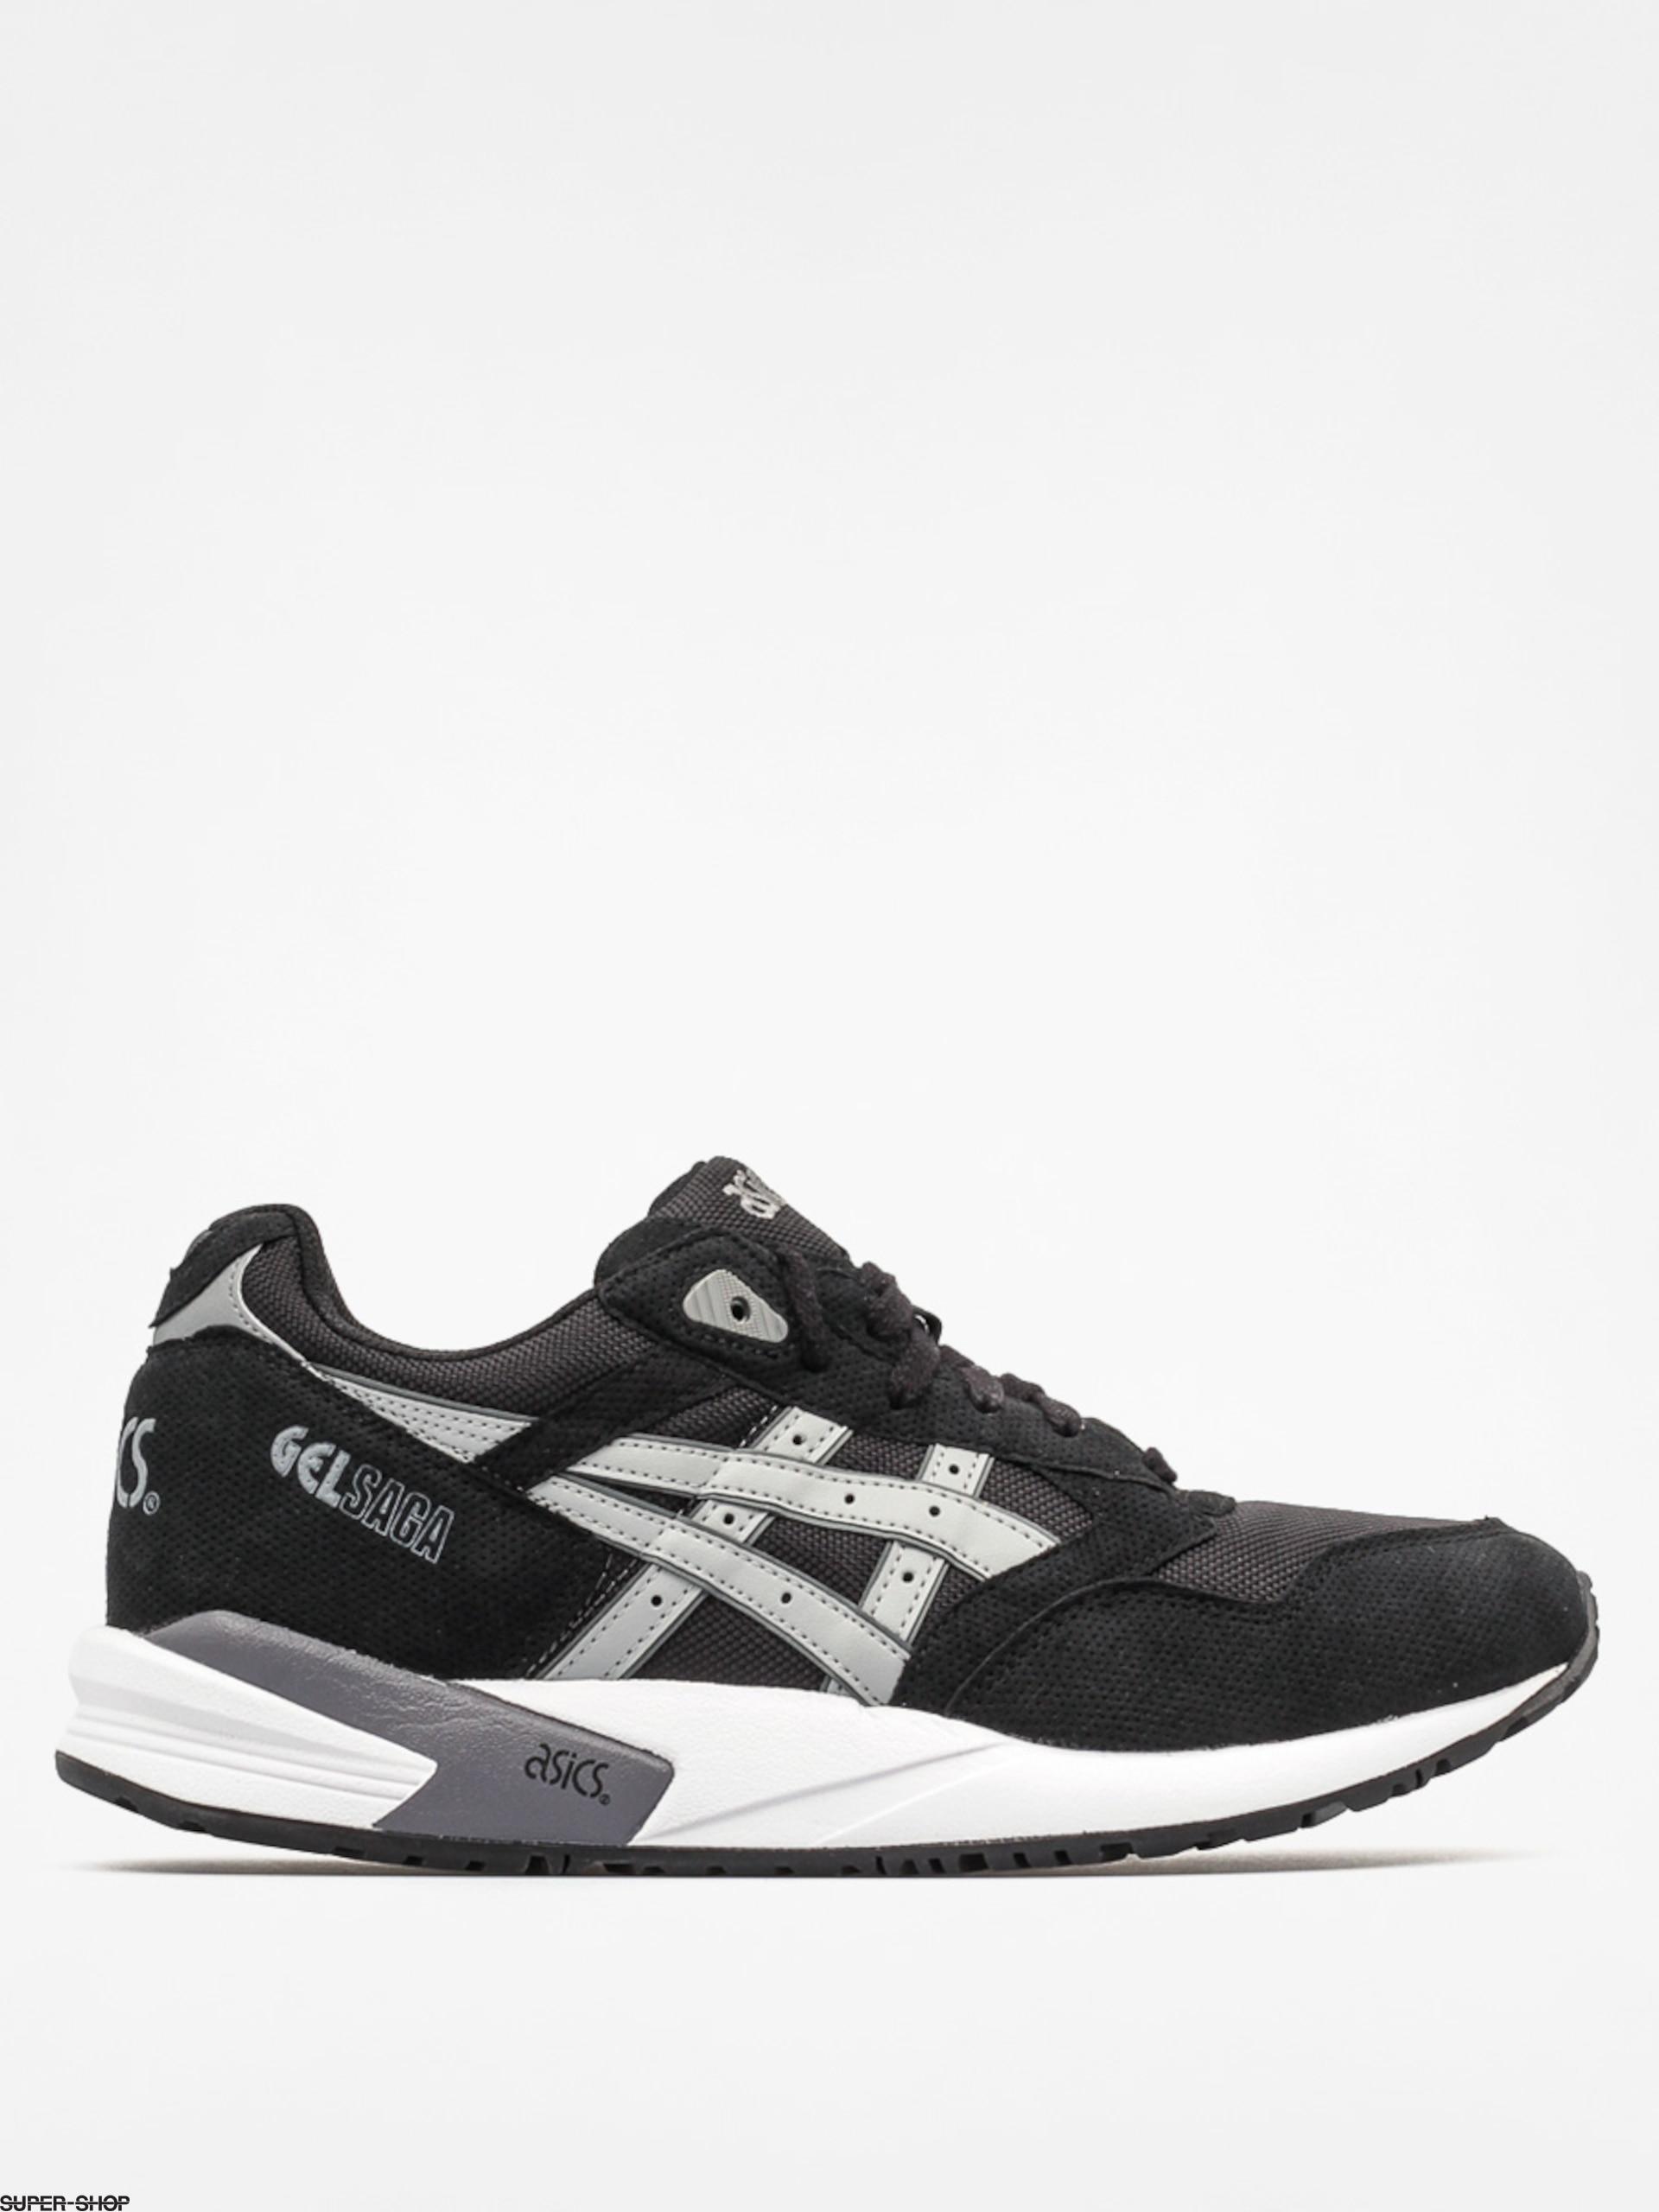 Asics Shoes Gelsaga (black/light grey)